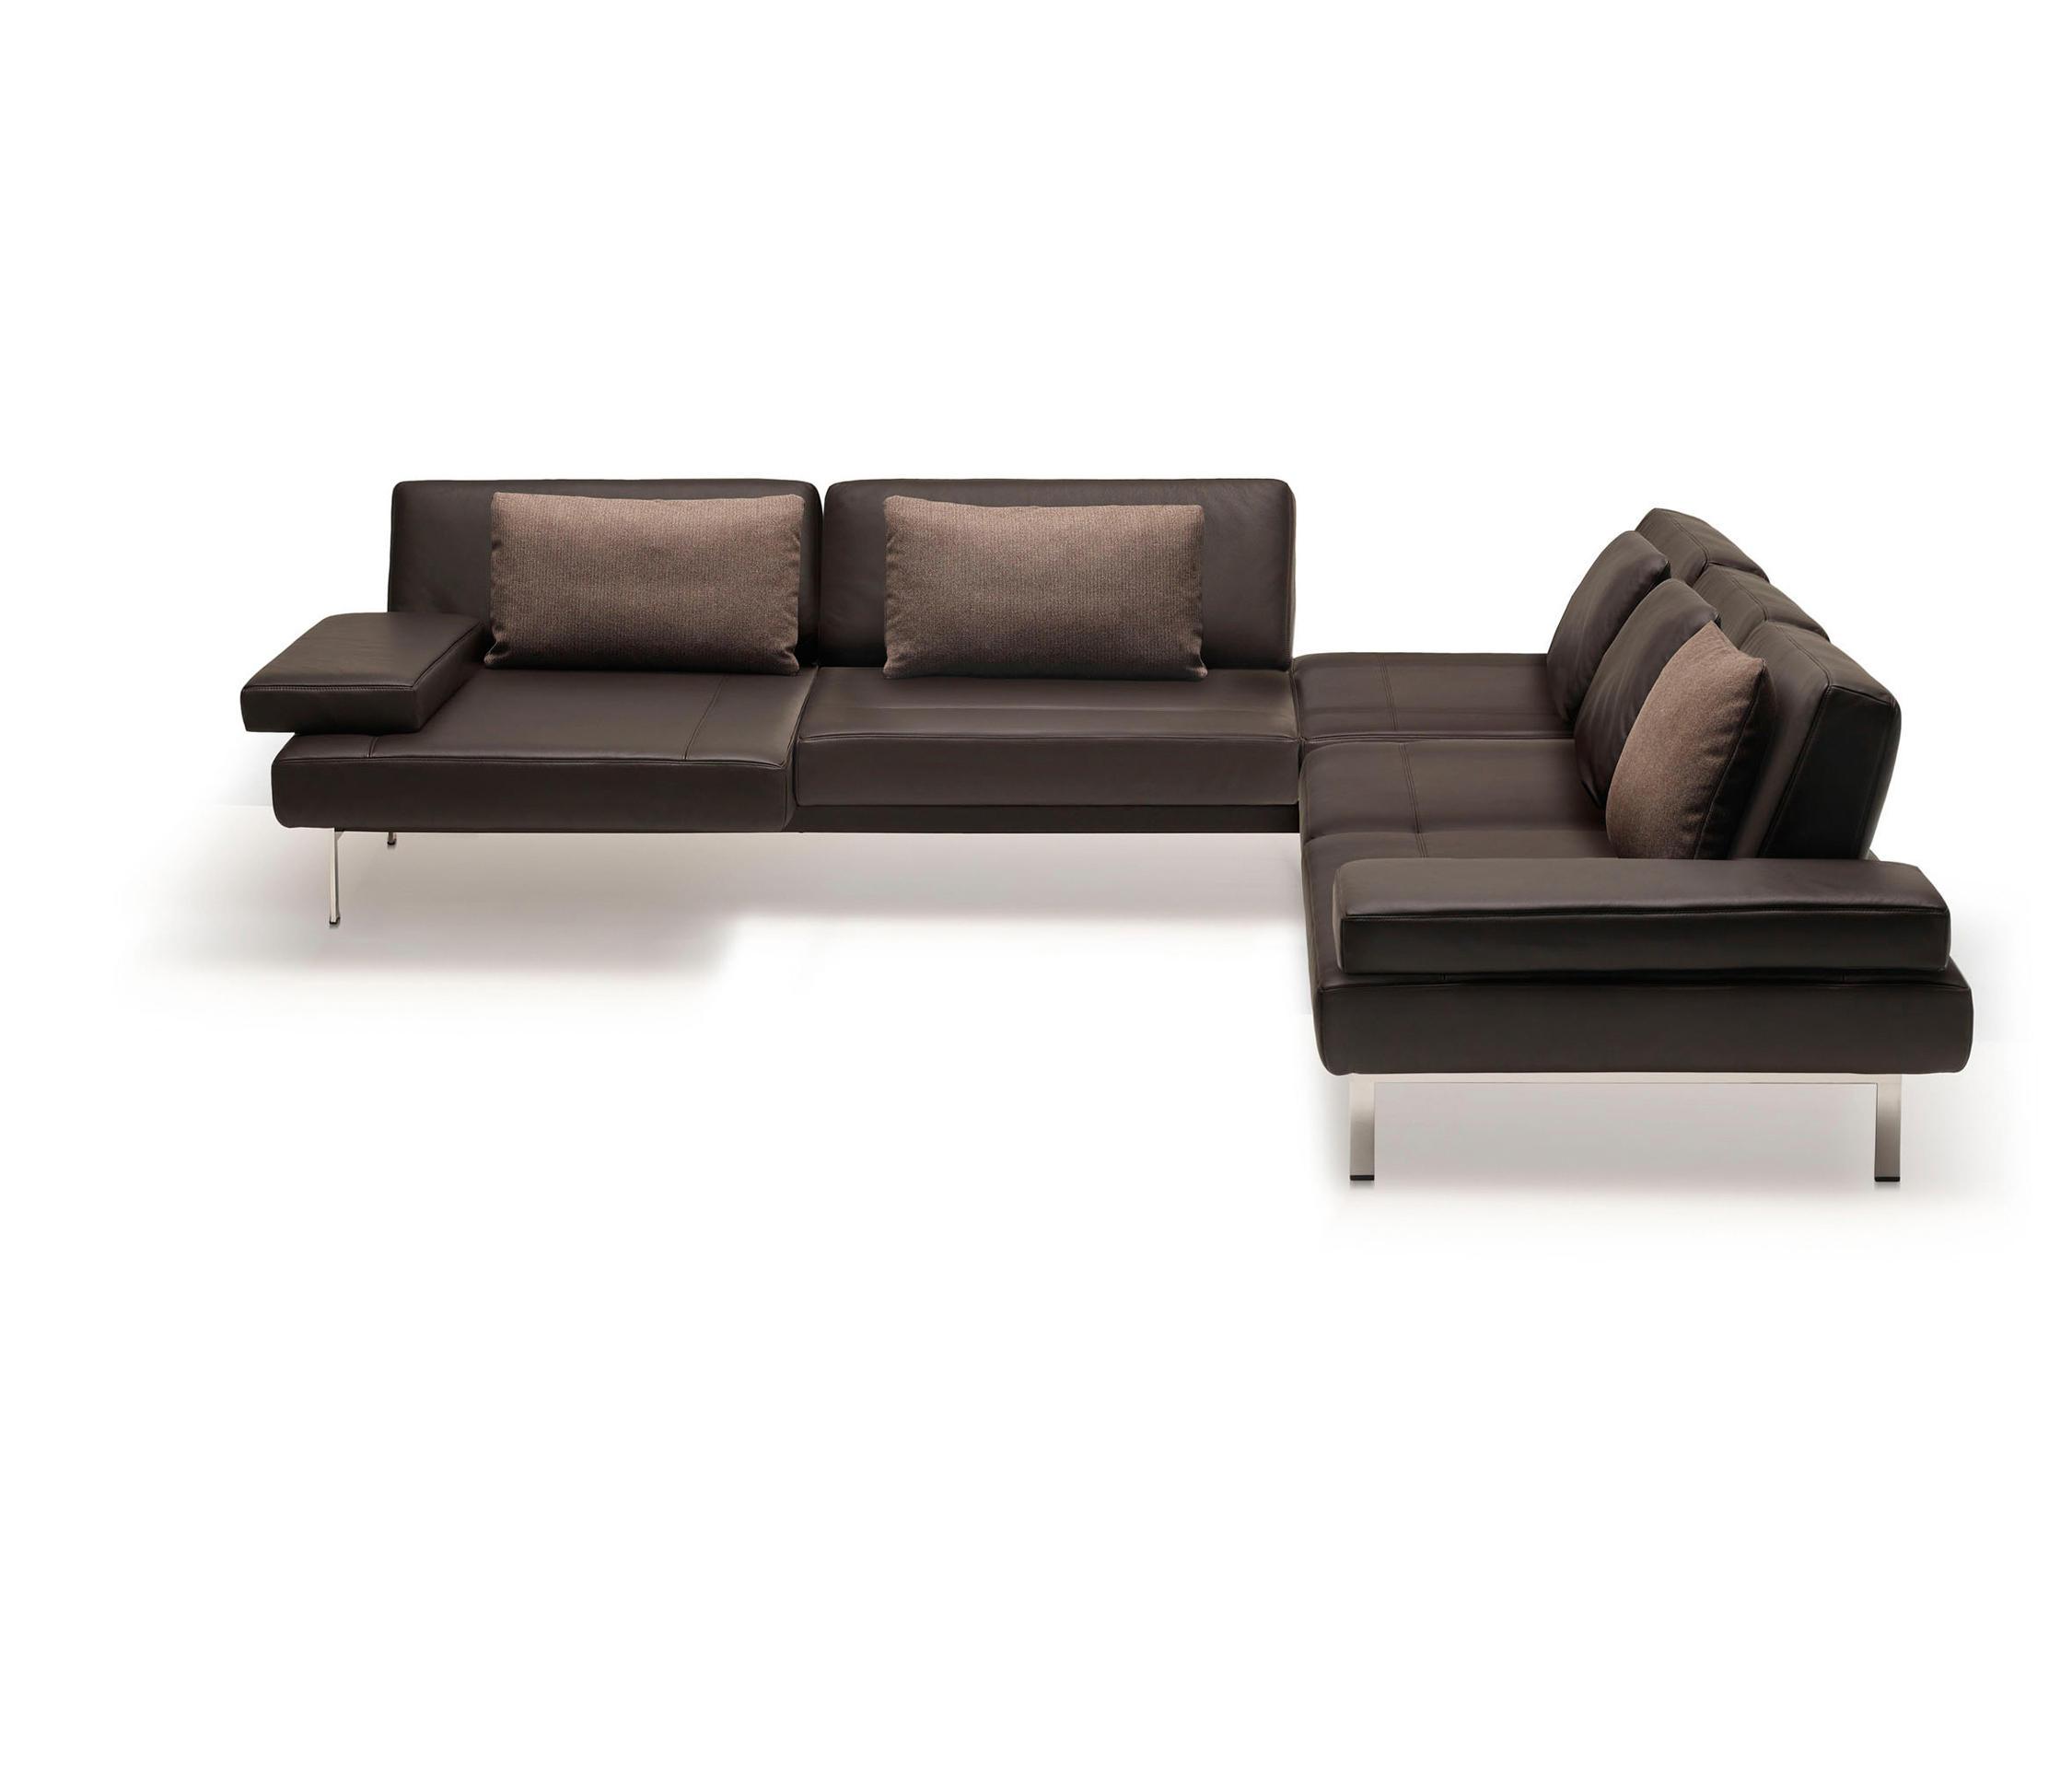 Full Size of De Sede Sofa Used For Sale Gebraucht Kaufen Bed Couch Usa Leder Furniture Uk Ds 47 Endless 600 By Preise 904 Sofas Von Architonic Ektorp Behindertengerechtes Sofa De Sede Sofa